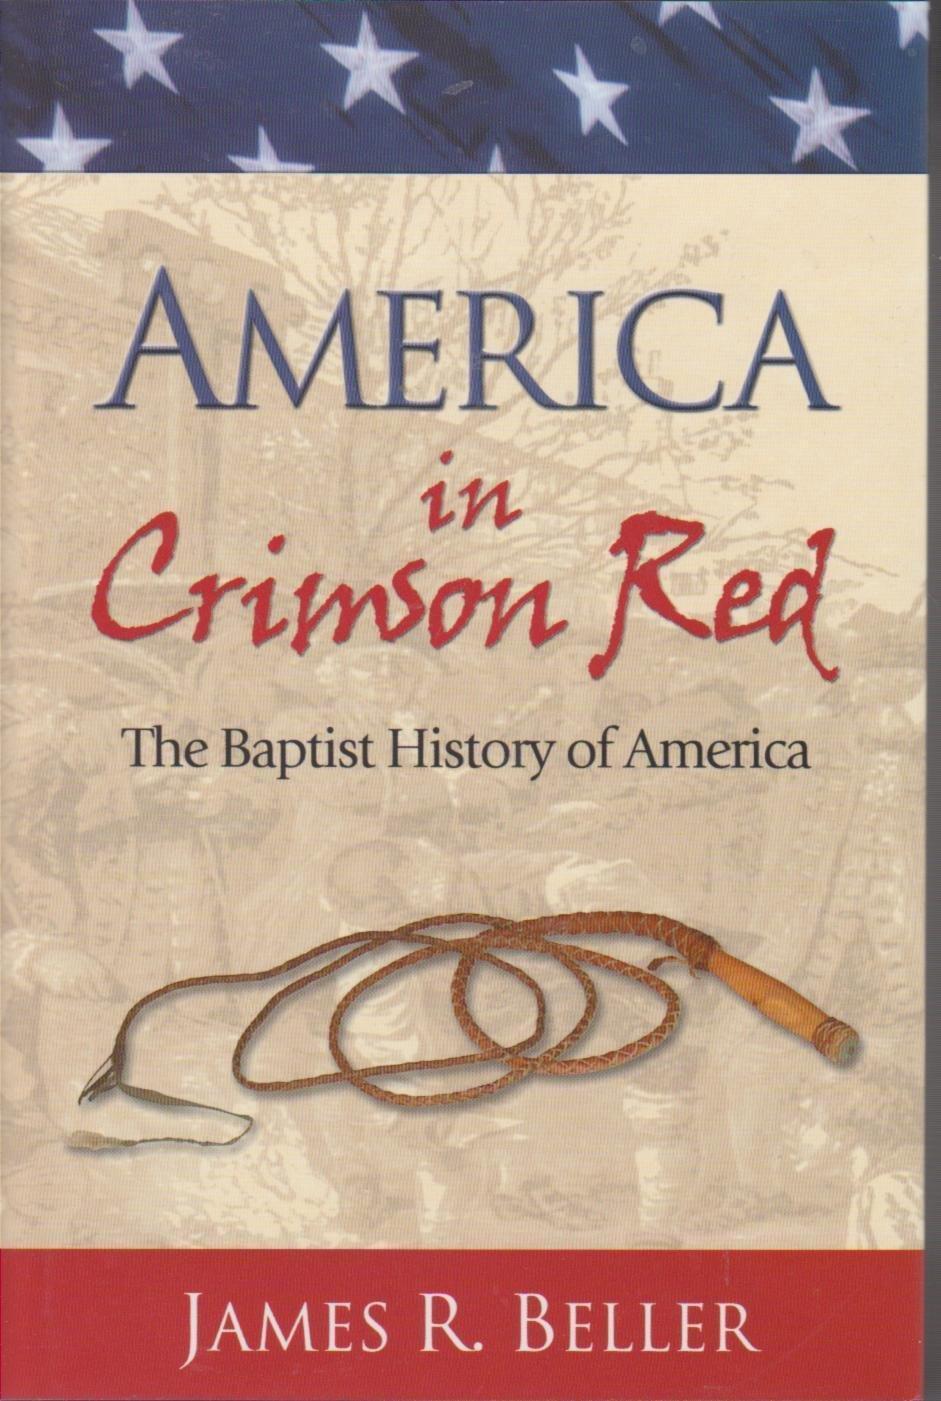 America in Crimson Red by James R. Beller